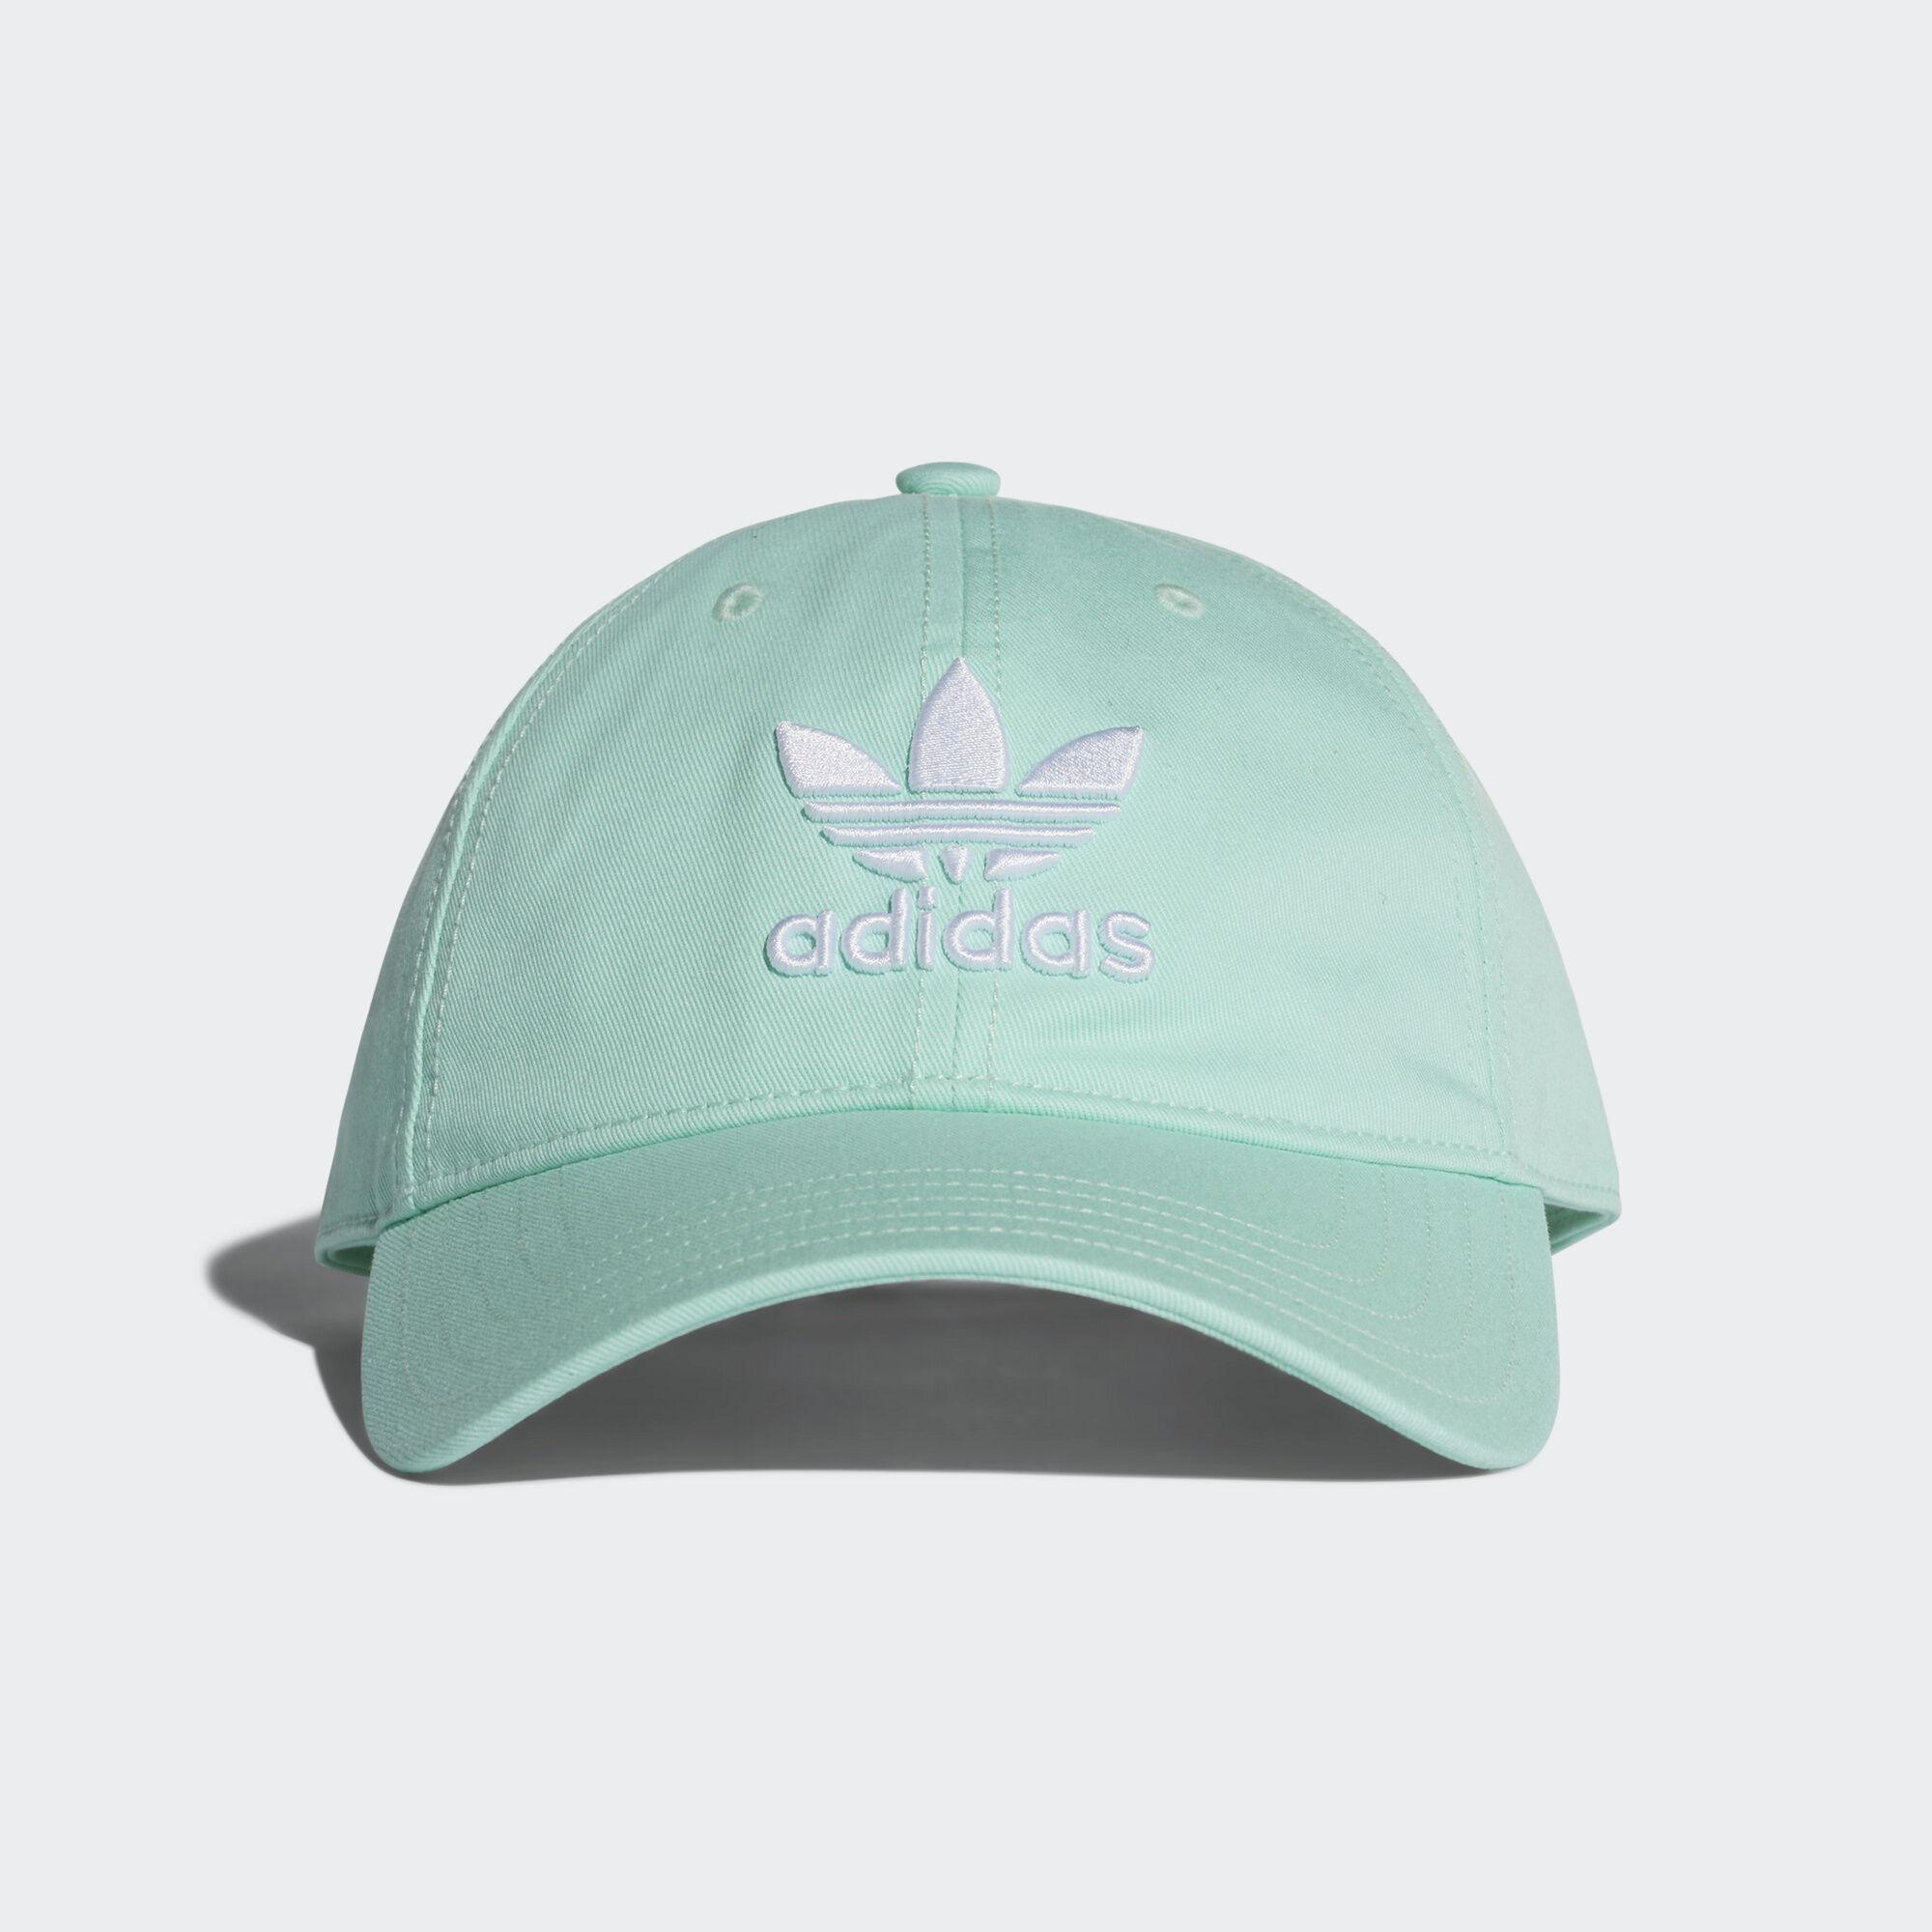 adidas - Trefoil Classic Cap Clear Mint   White DJ0883 7a6b22e5e27